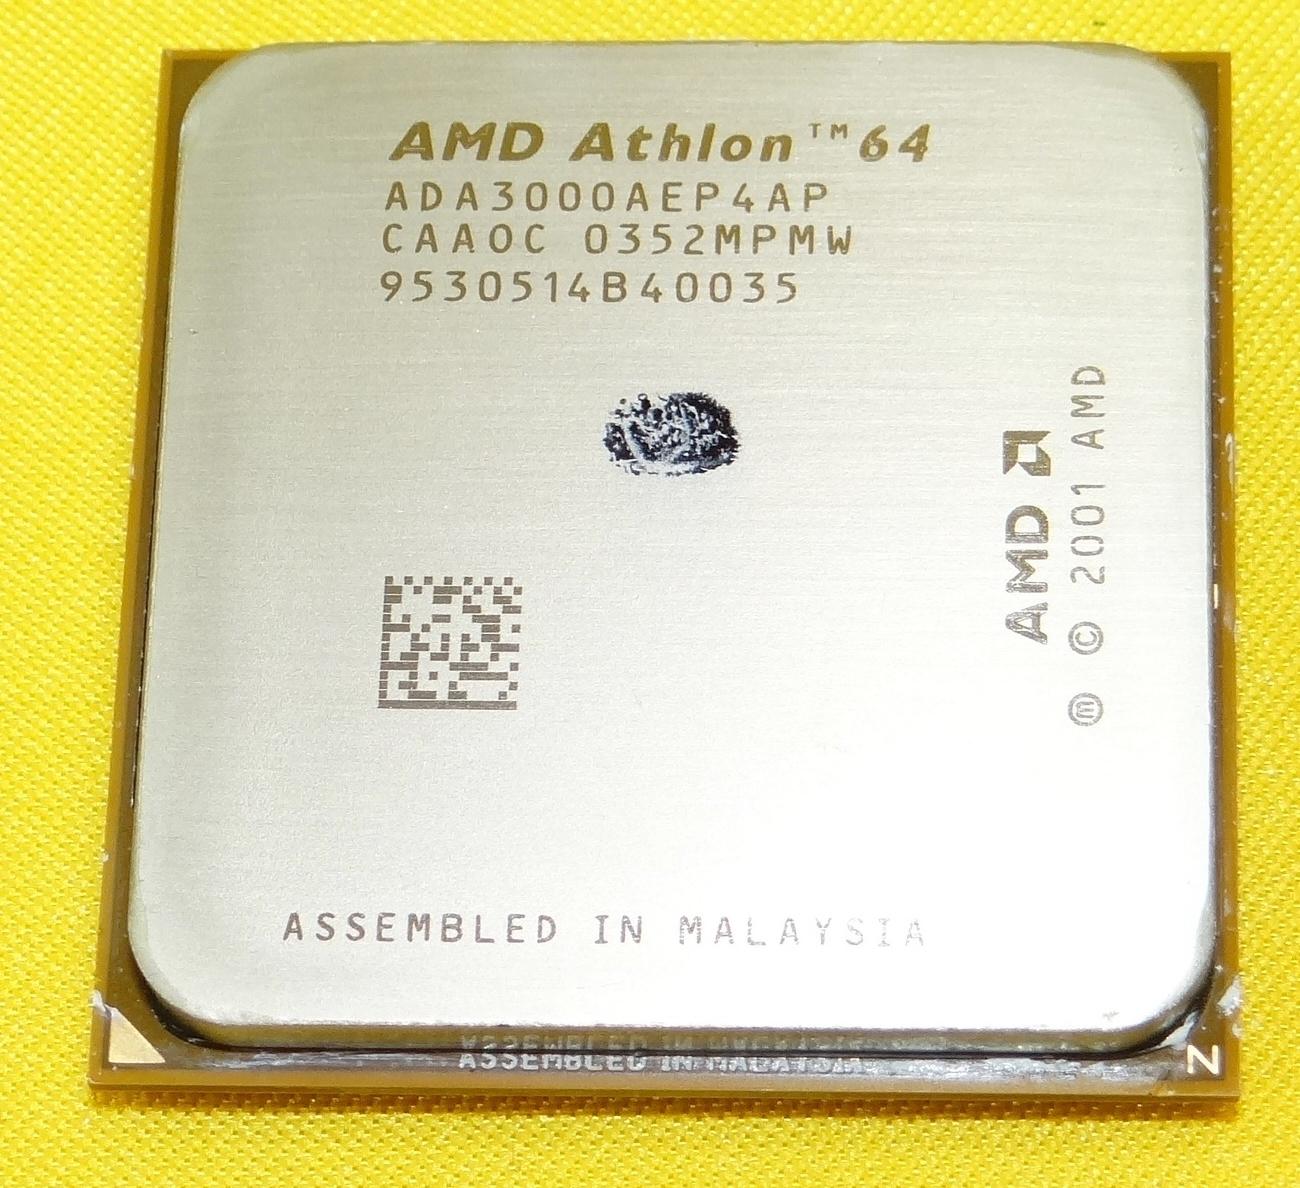 1280x1024 amd athlon 64 - photo #49